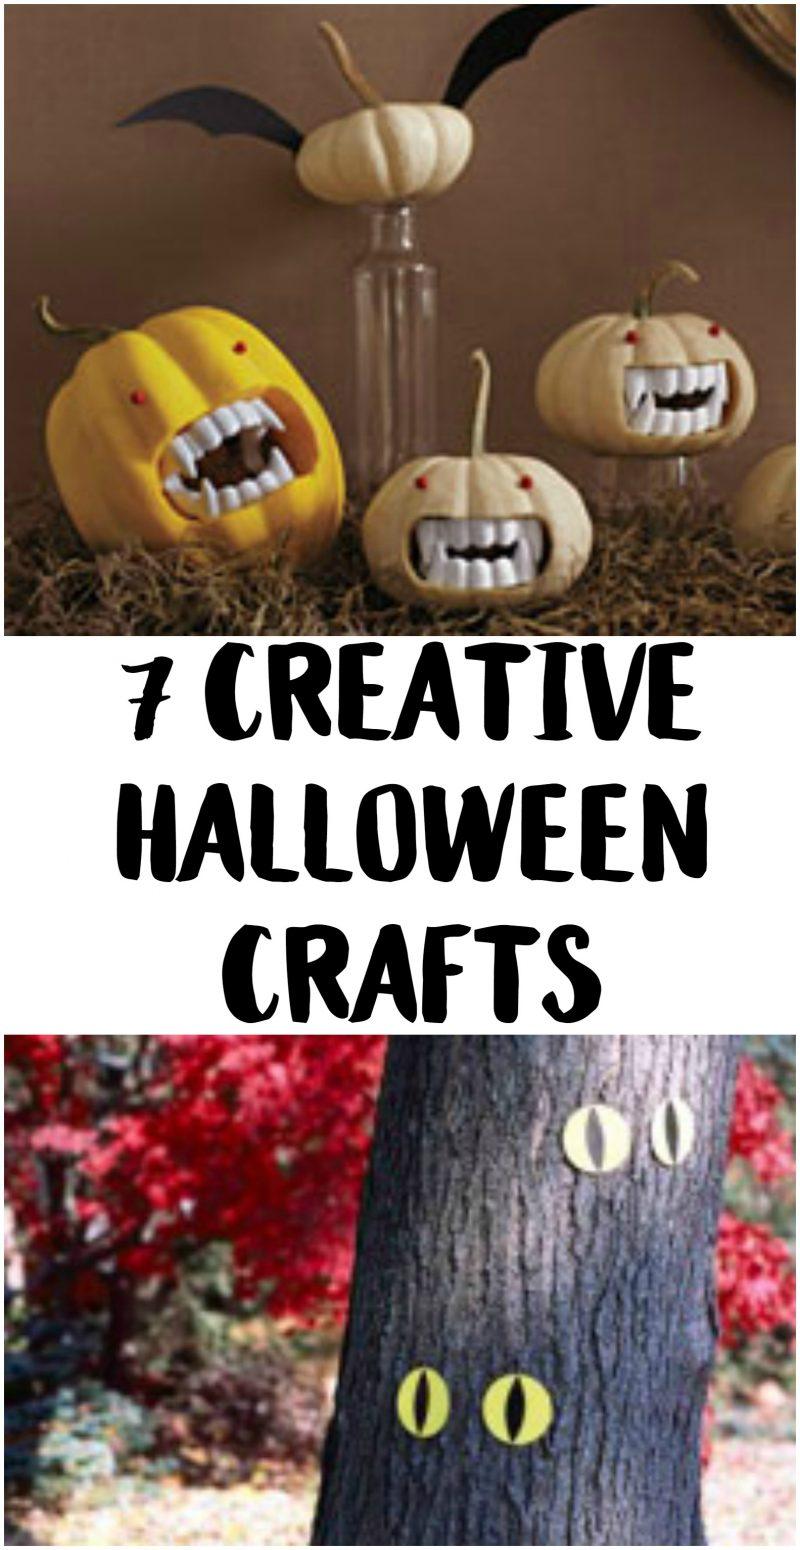 4 Easy No Carve Glow In The Dark Pumpkin Decorating Ideas